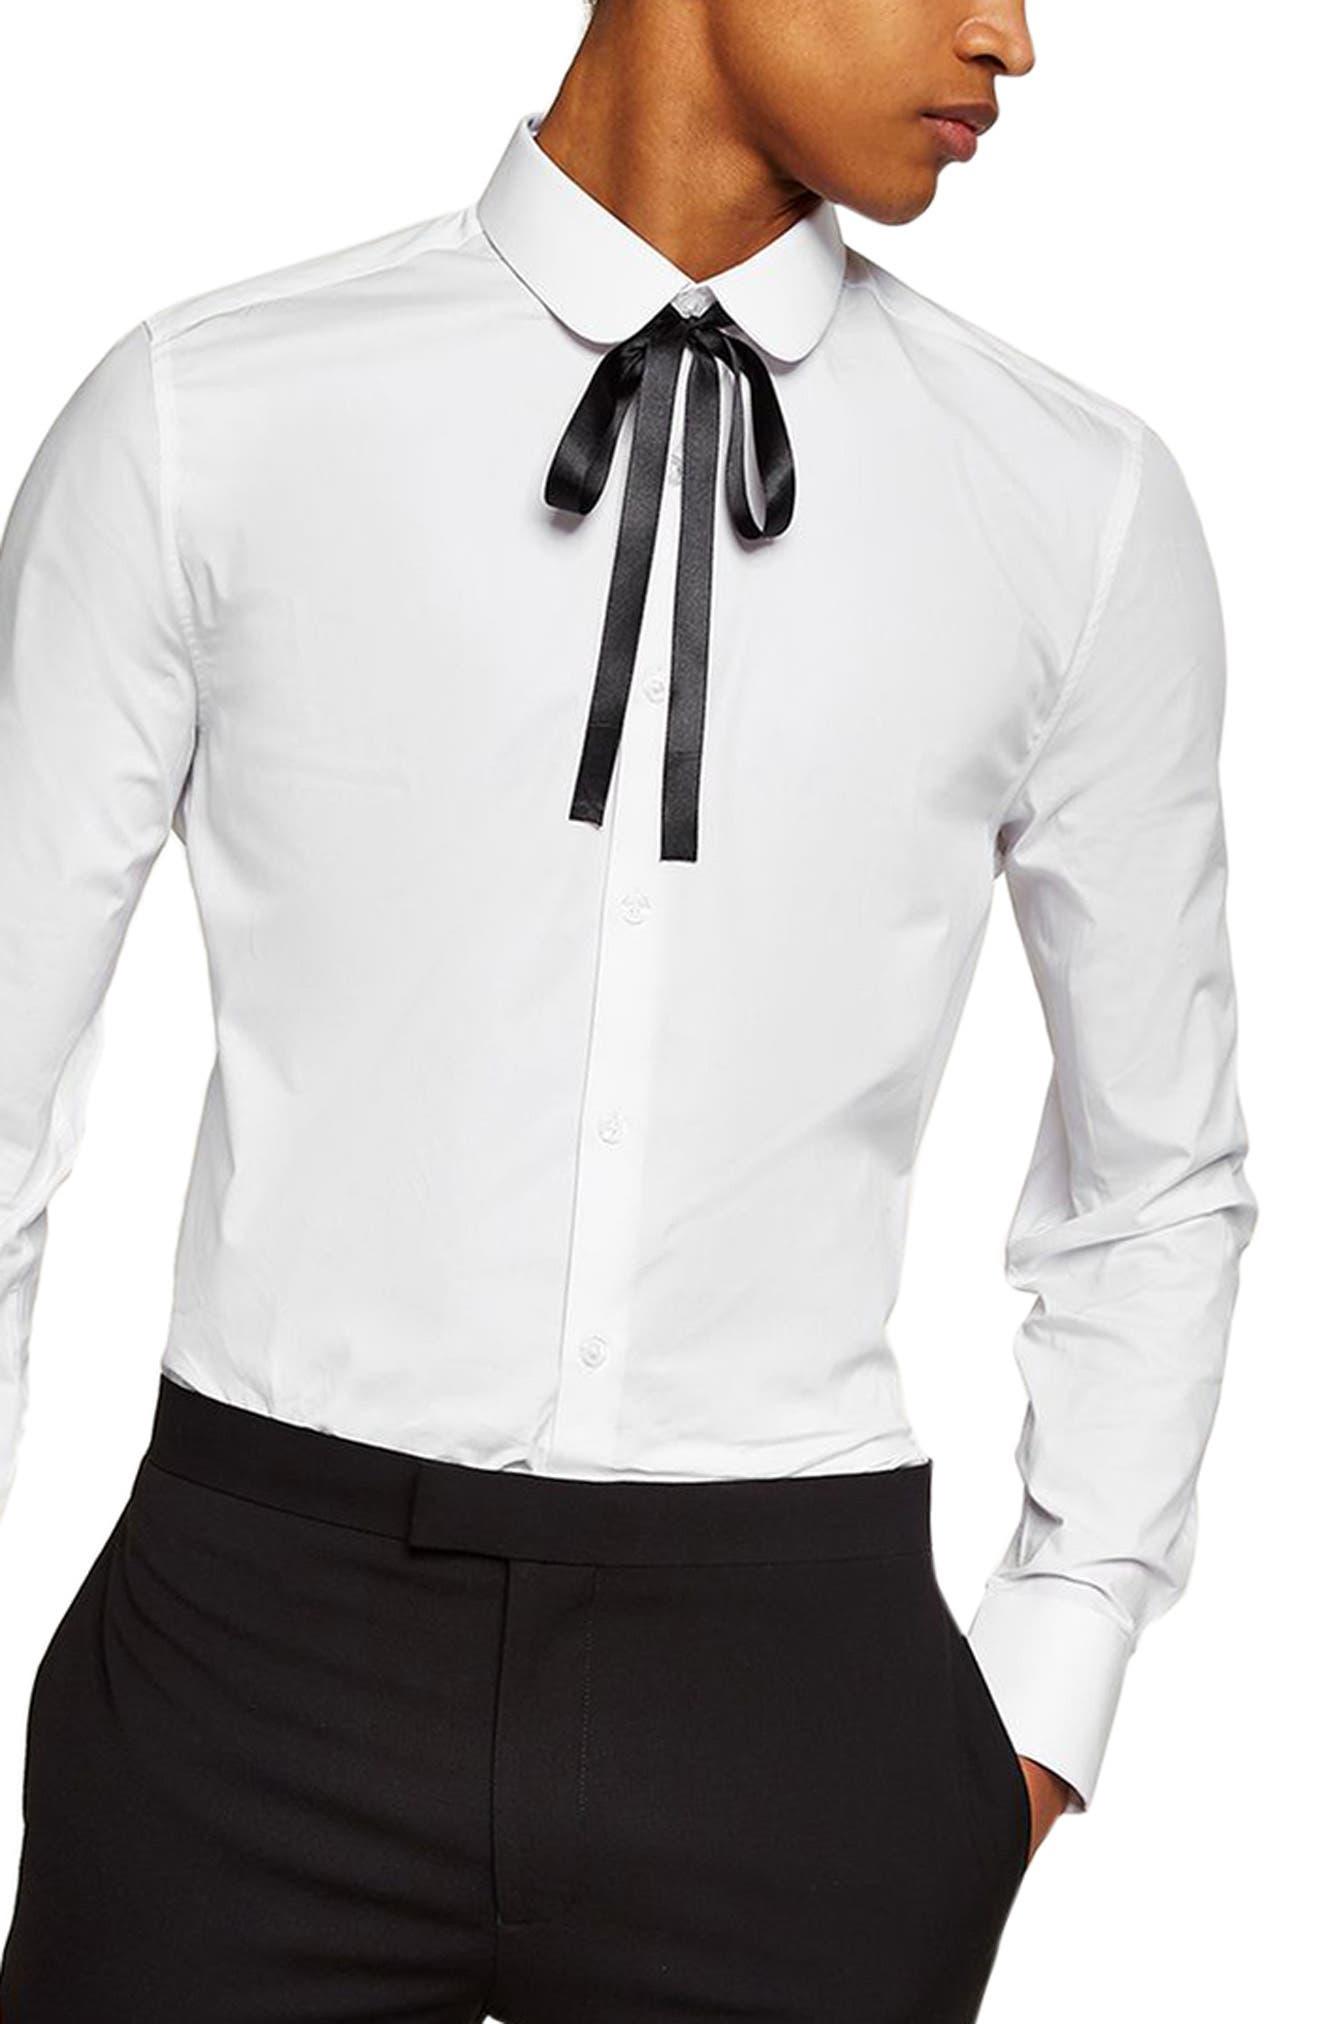 Penny Collar Shirt,                         Main,                         color, White Multi